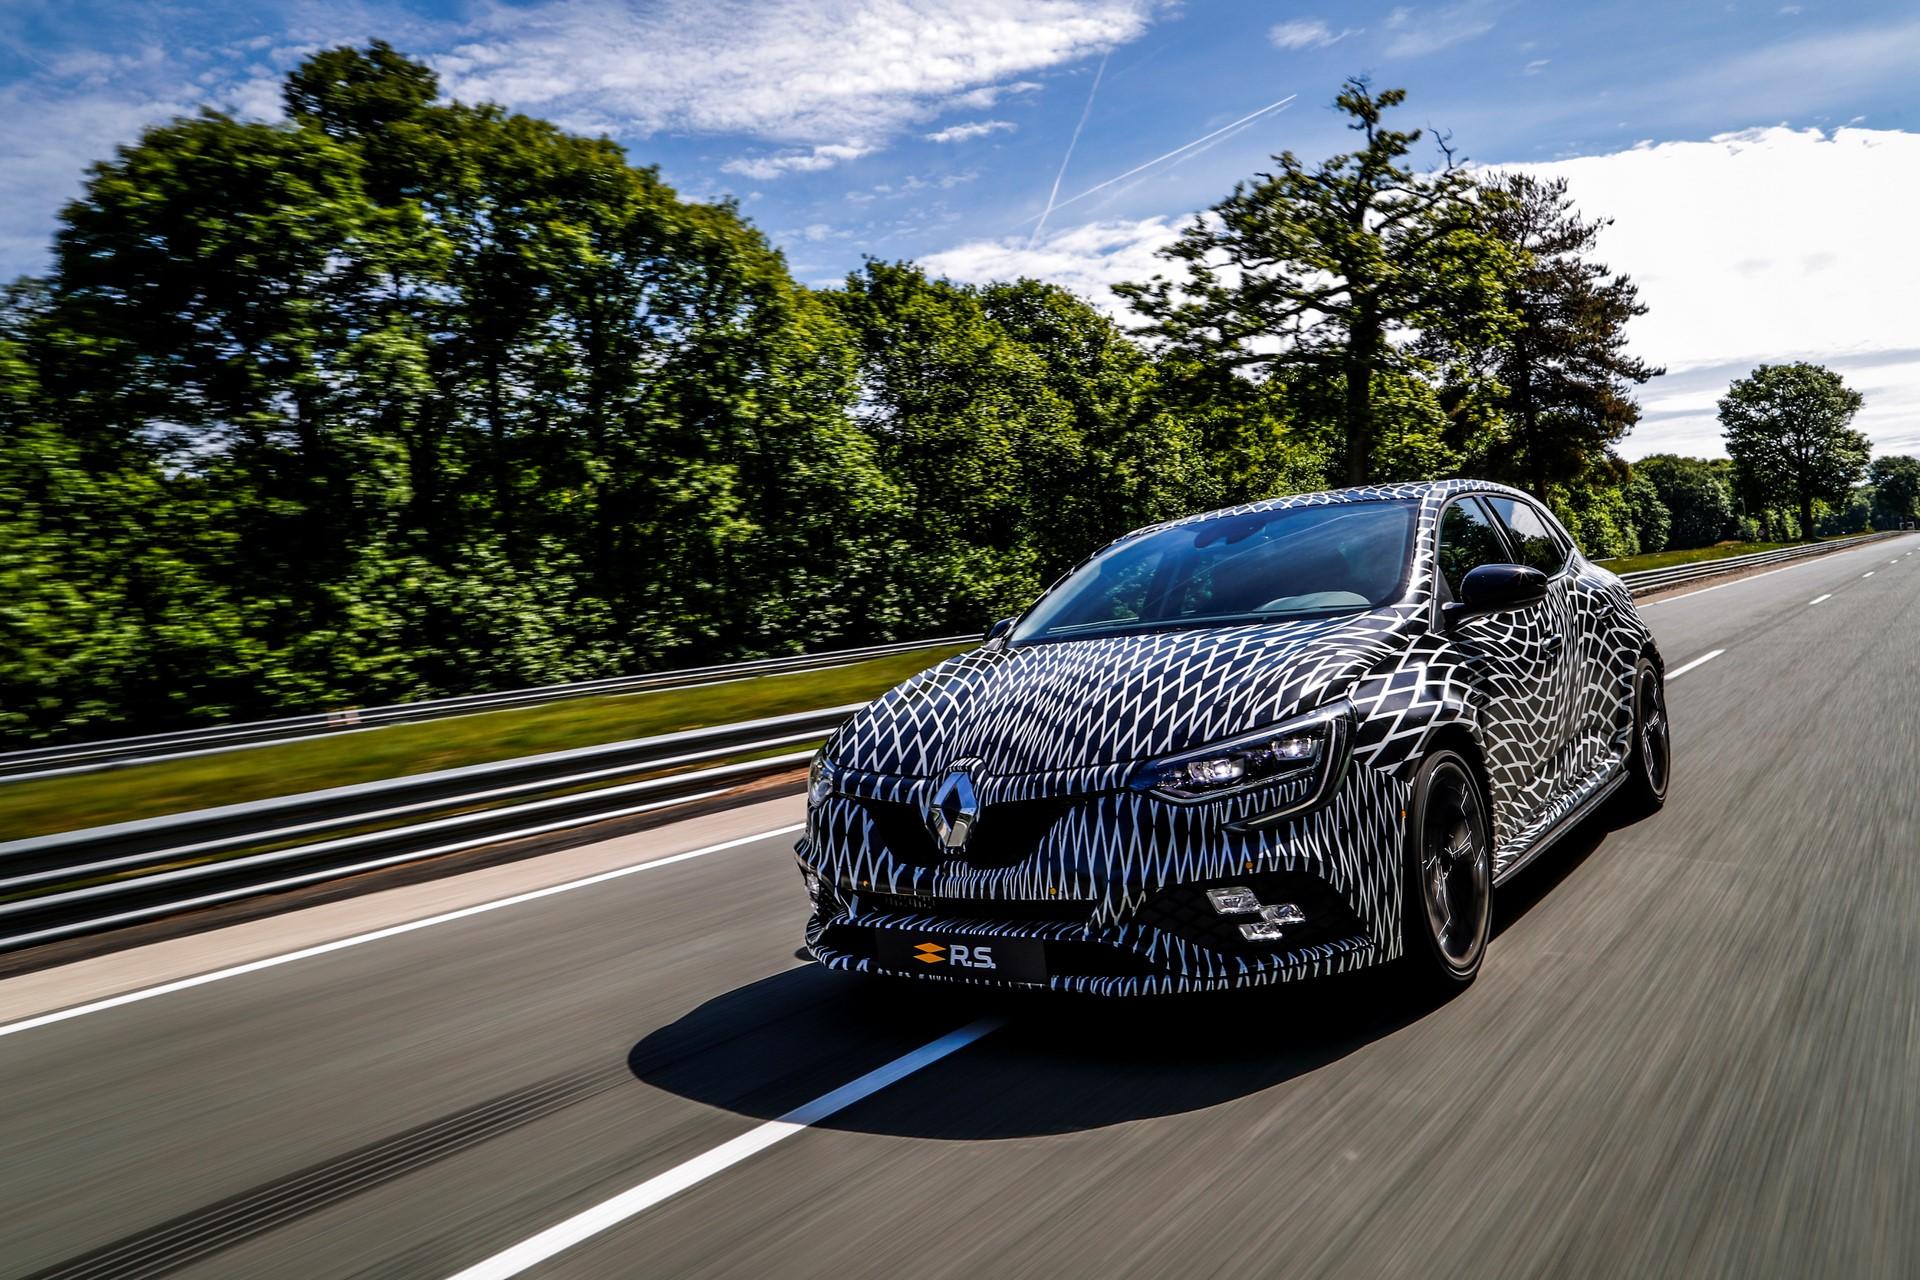 Renault Megane R.S 2018 monaco (2)